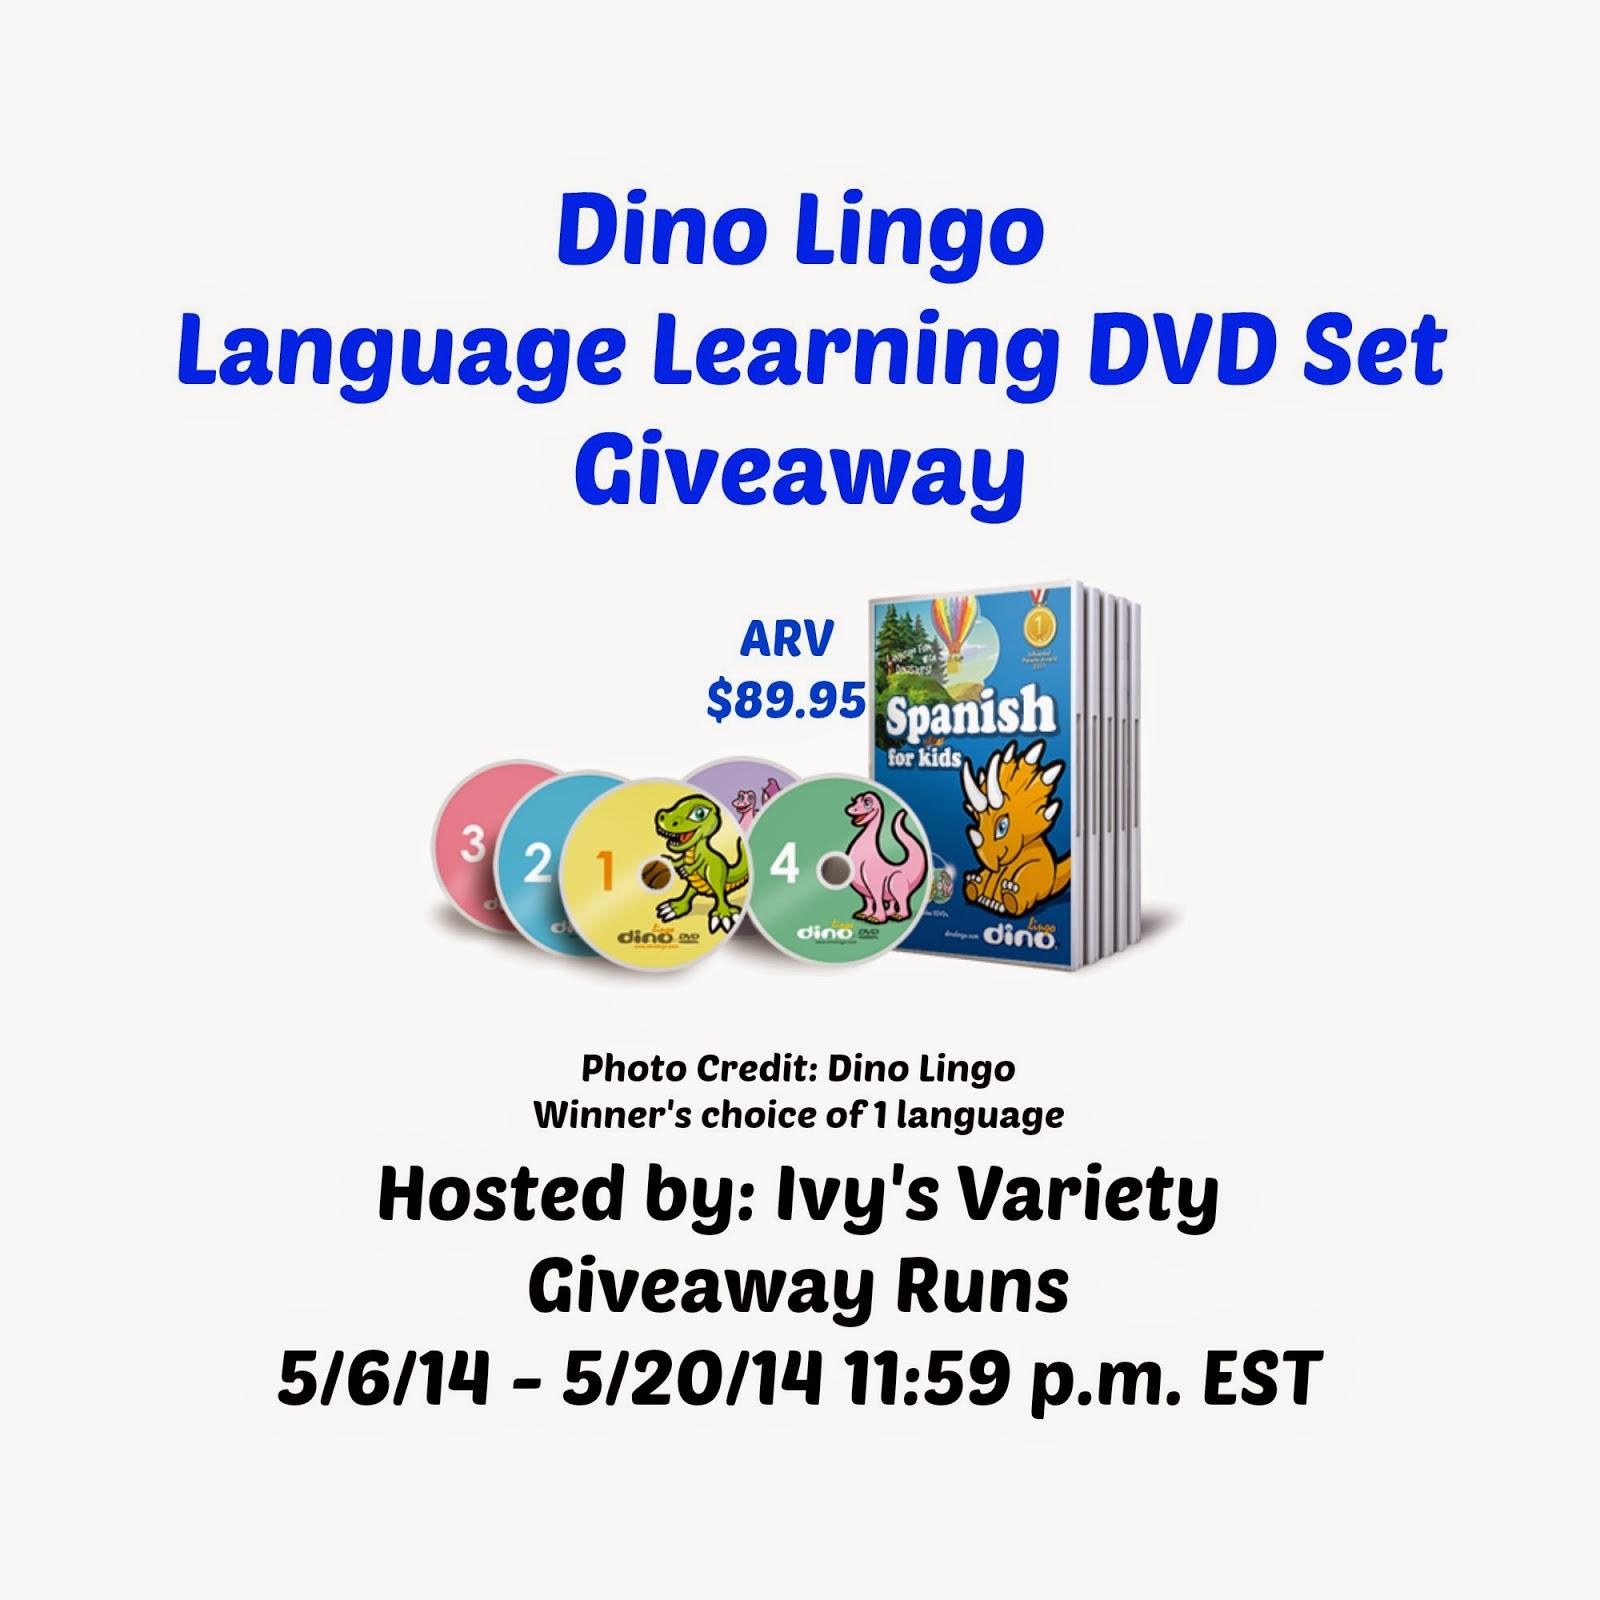 Dino Lingo language learning set giveaway